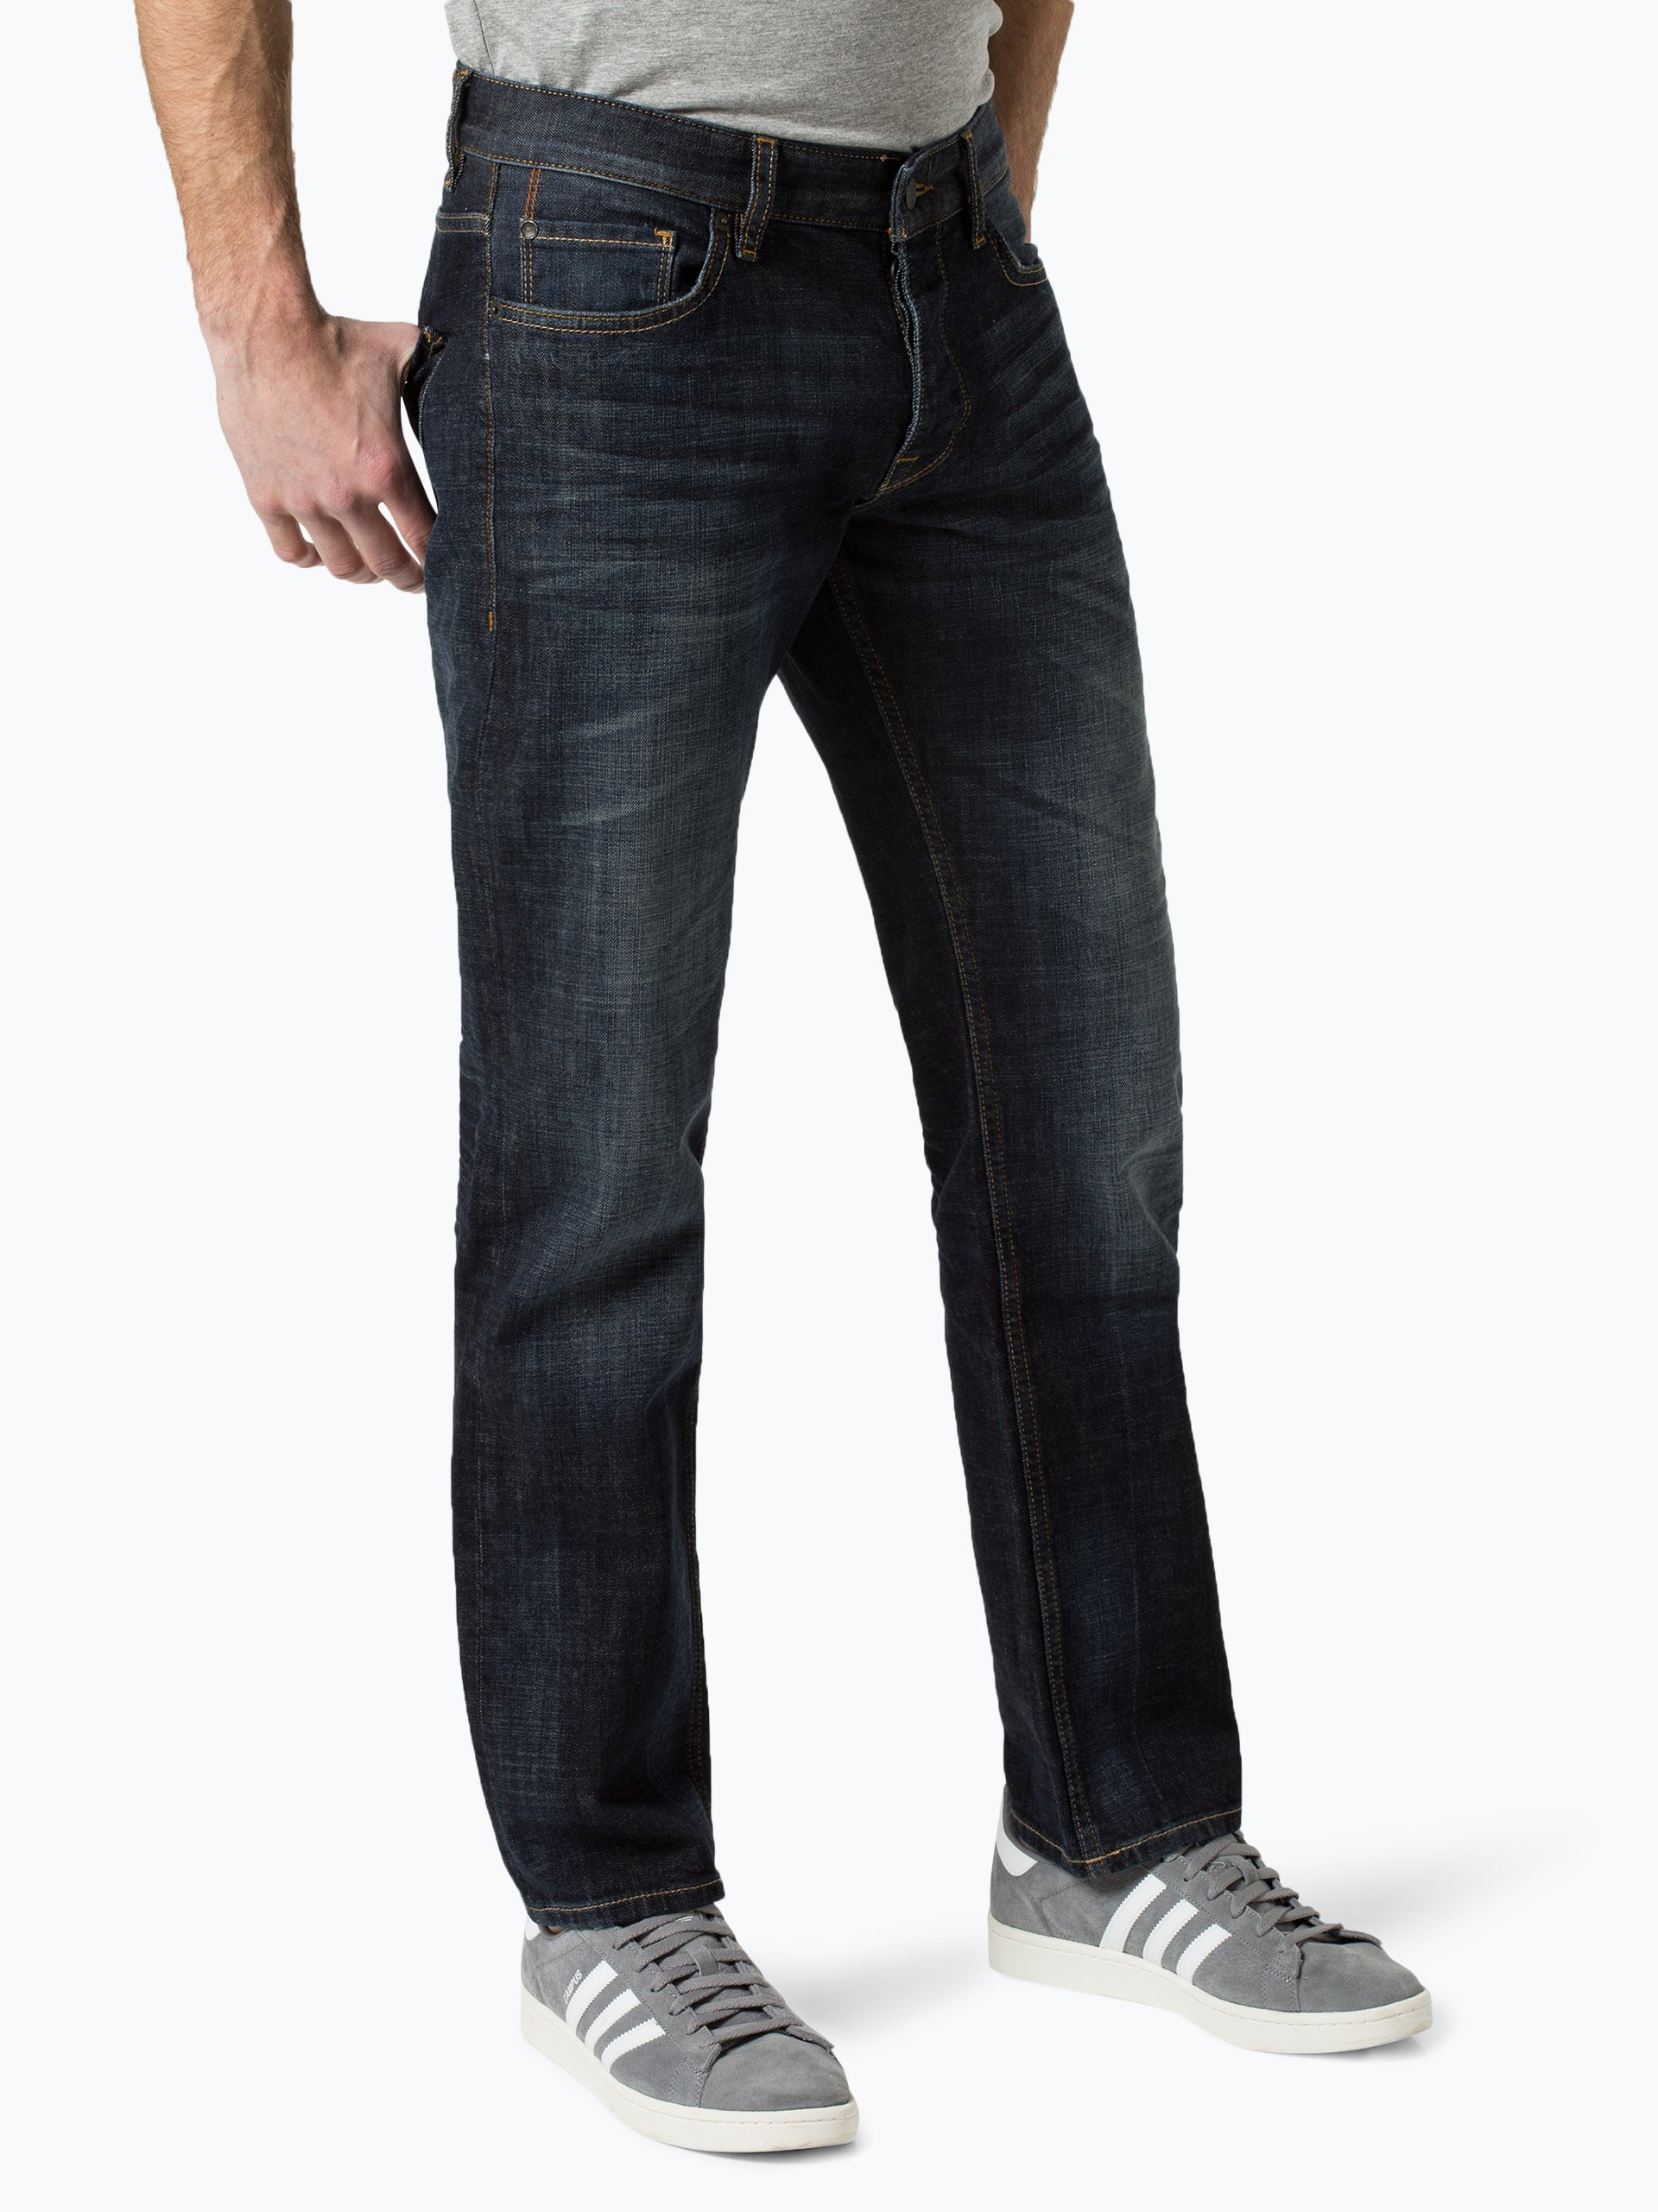 boss casual herren jeans orange25 online kaufen vangraaf com. Black Bedroom Furniture Sets. Home Design Ideas